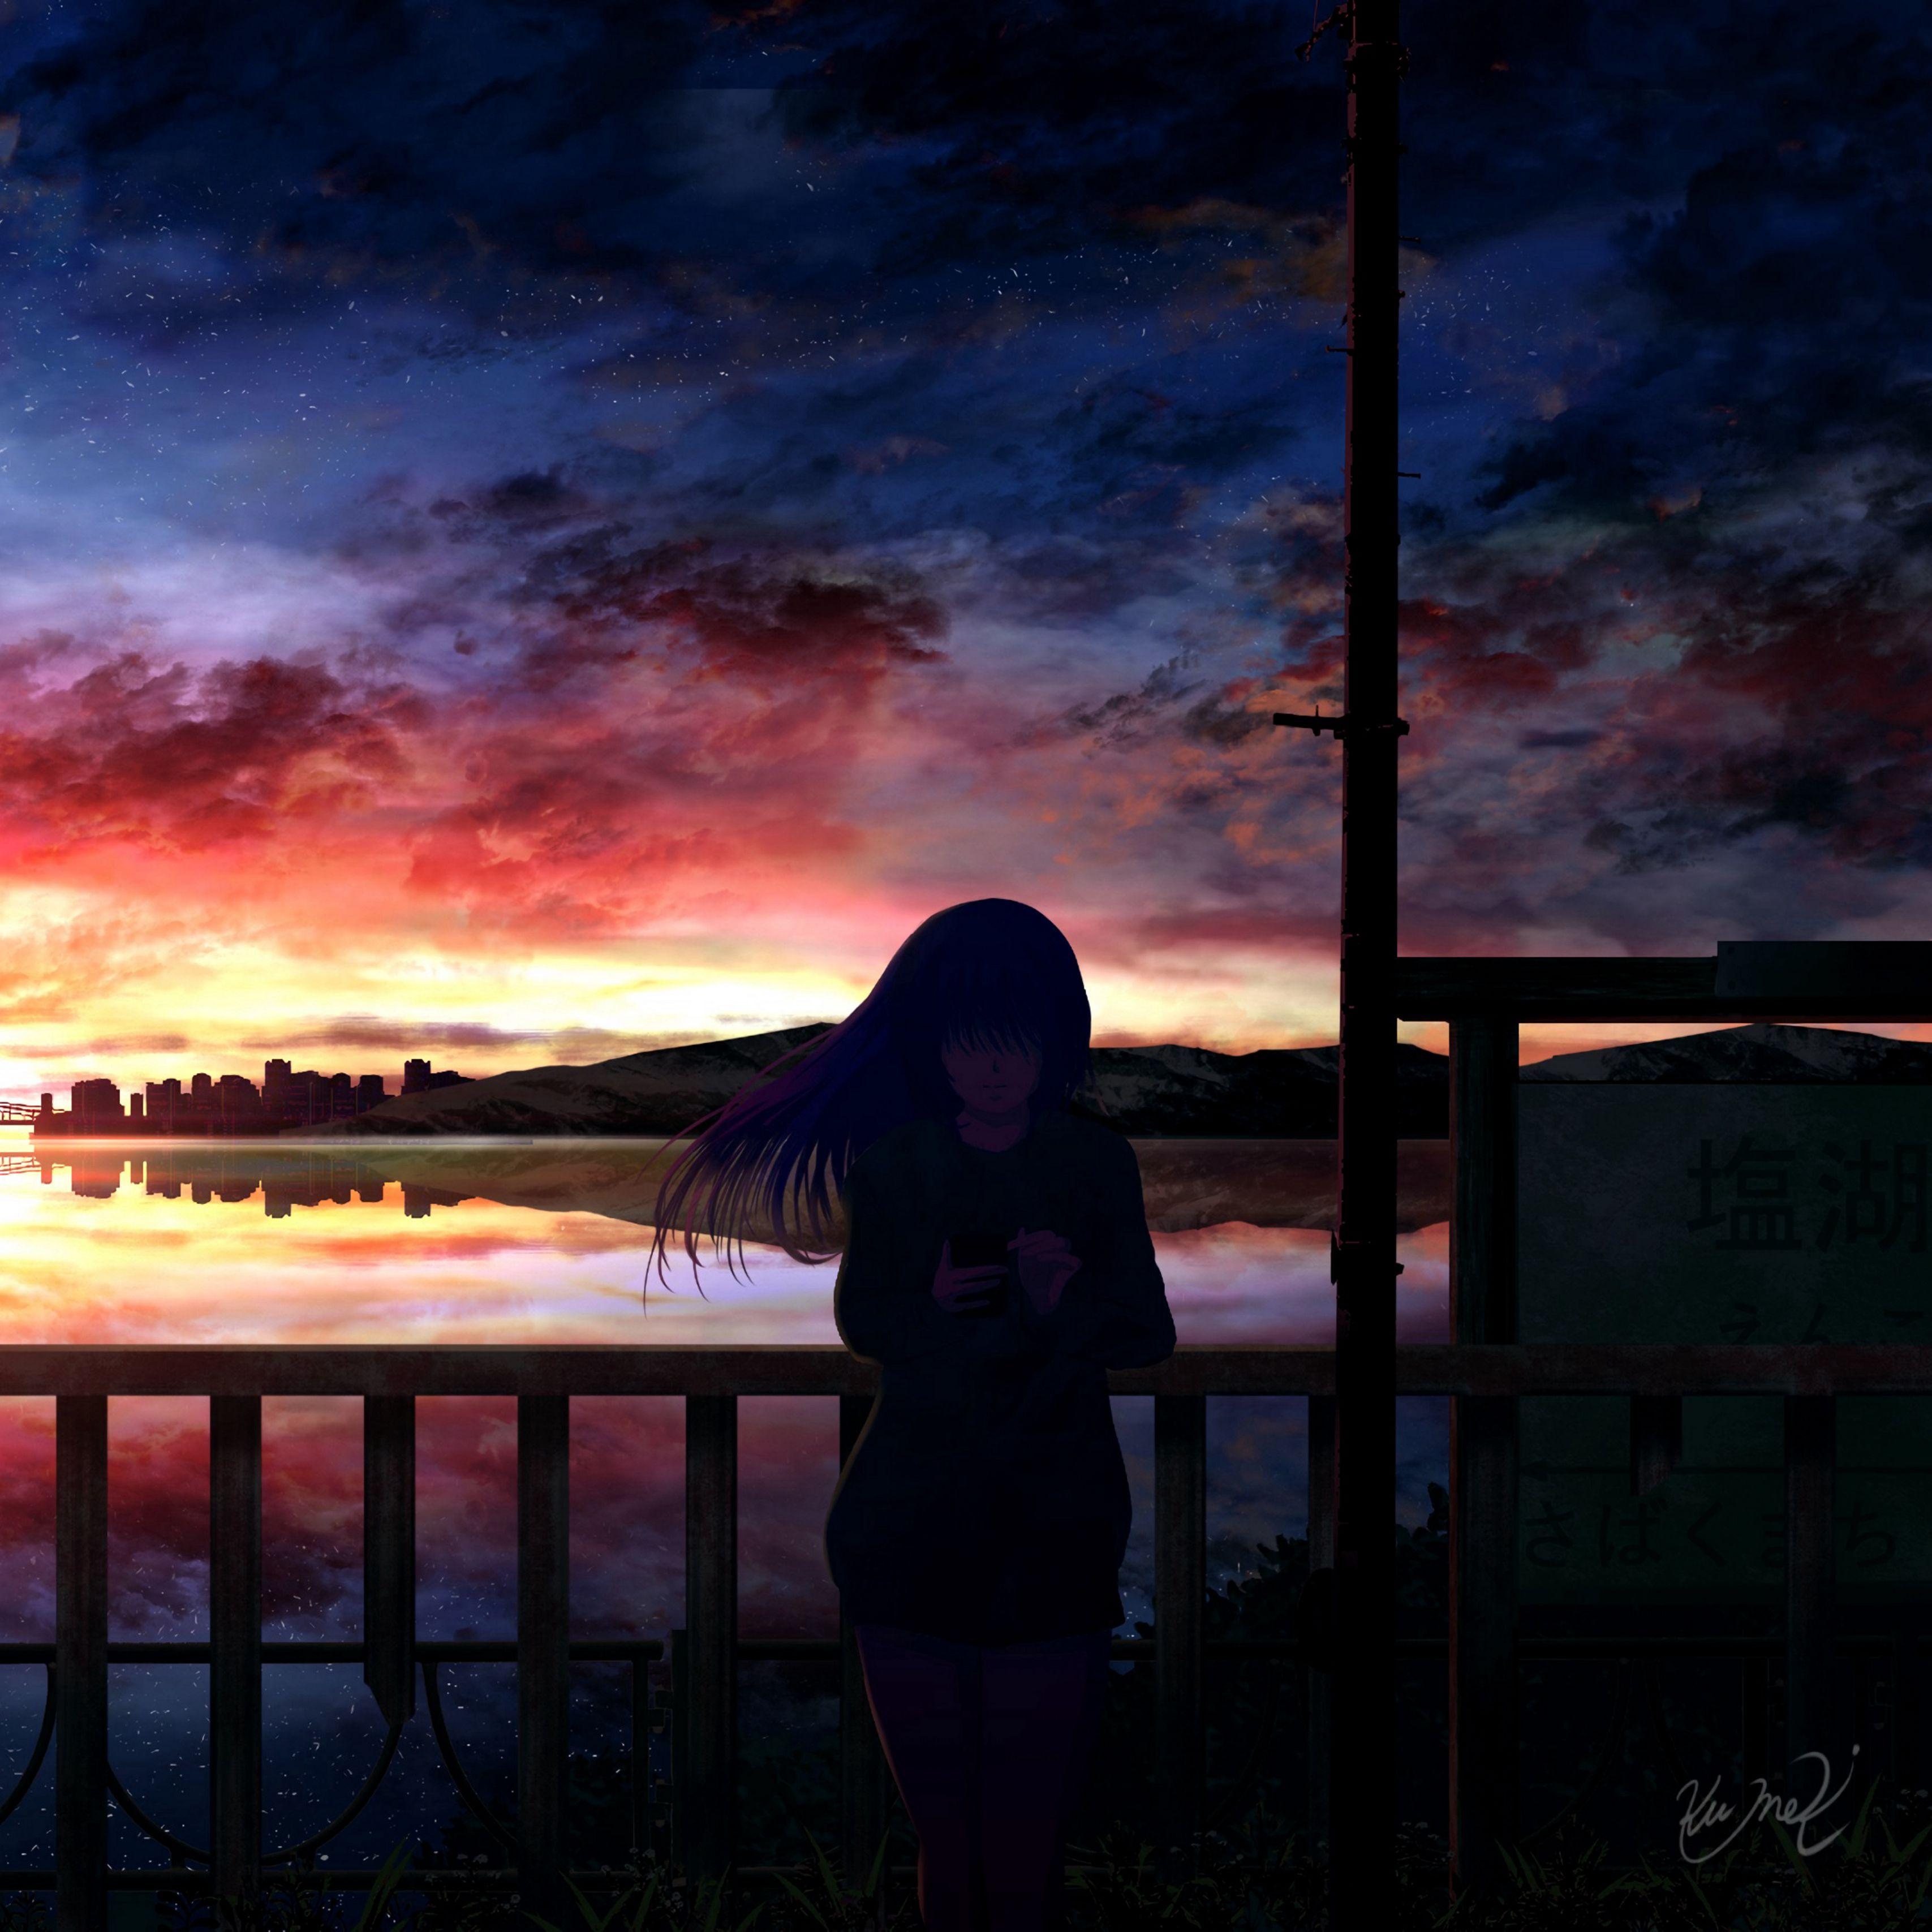 3415x3415 Wallpaper silhouette, night, starry sky, girl, anime